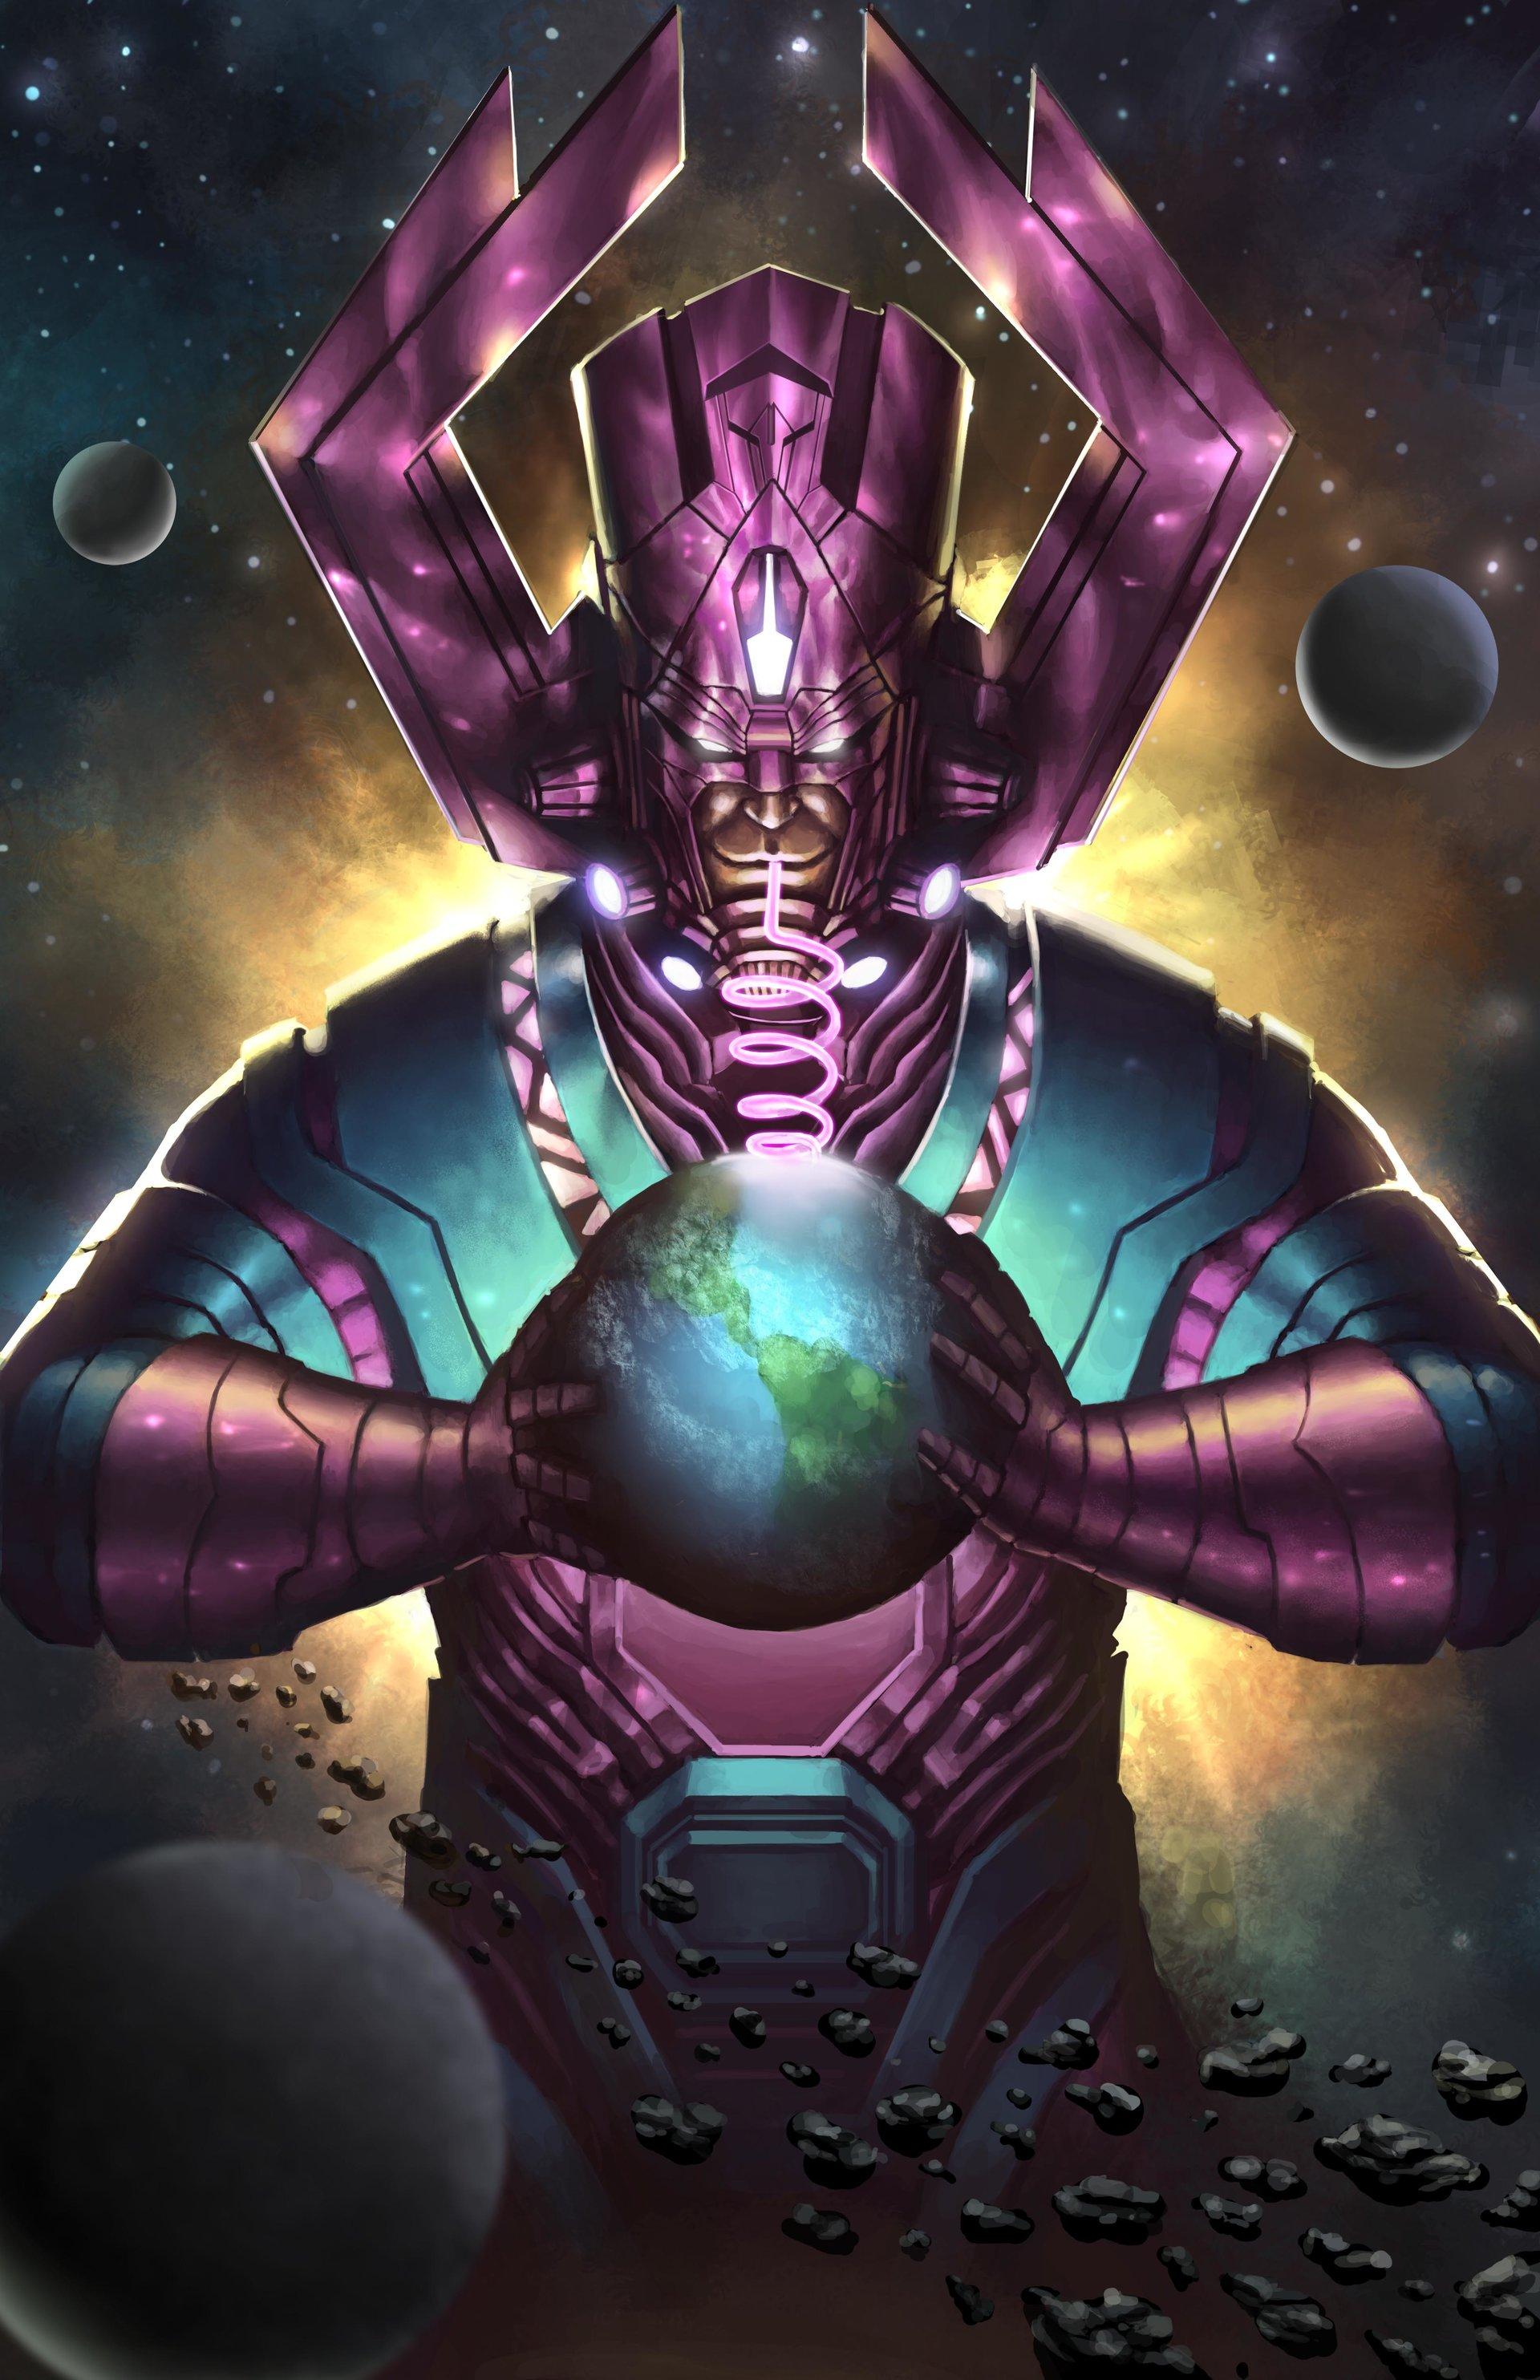 Infinity Sign Wallpaper Hd Artstation Galactus Oliver Morit